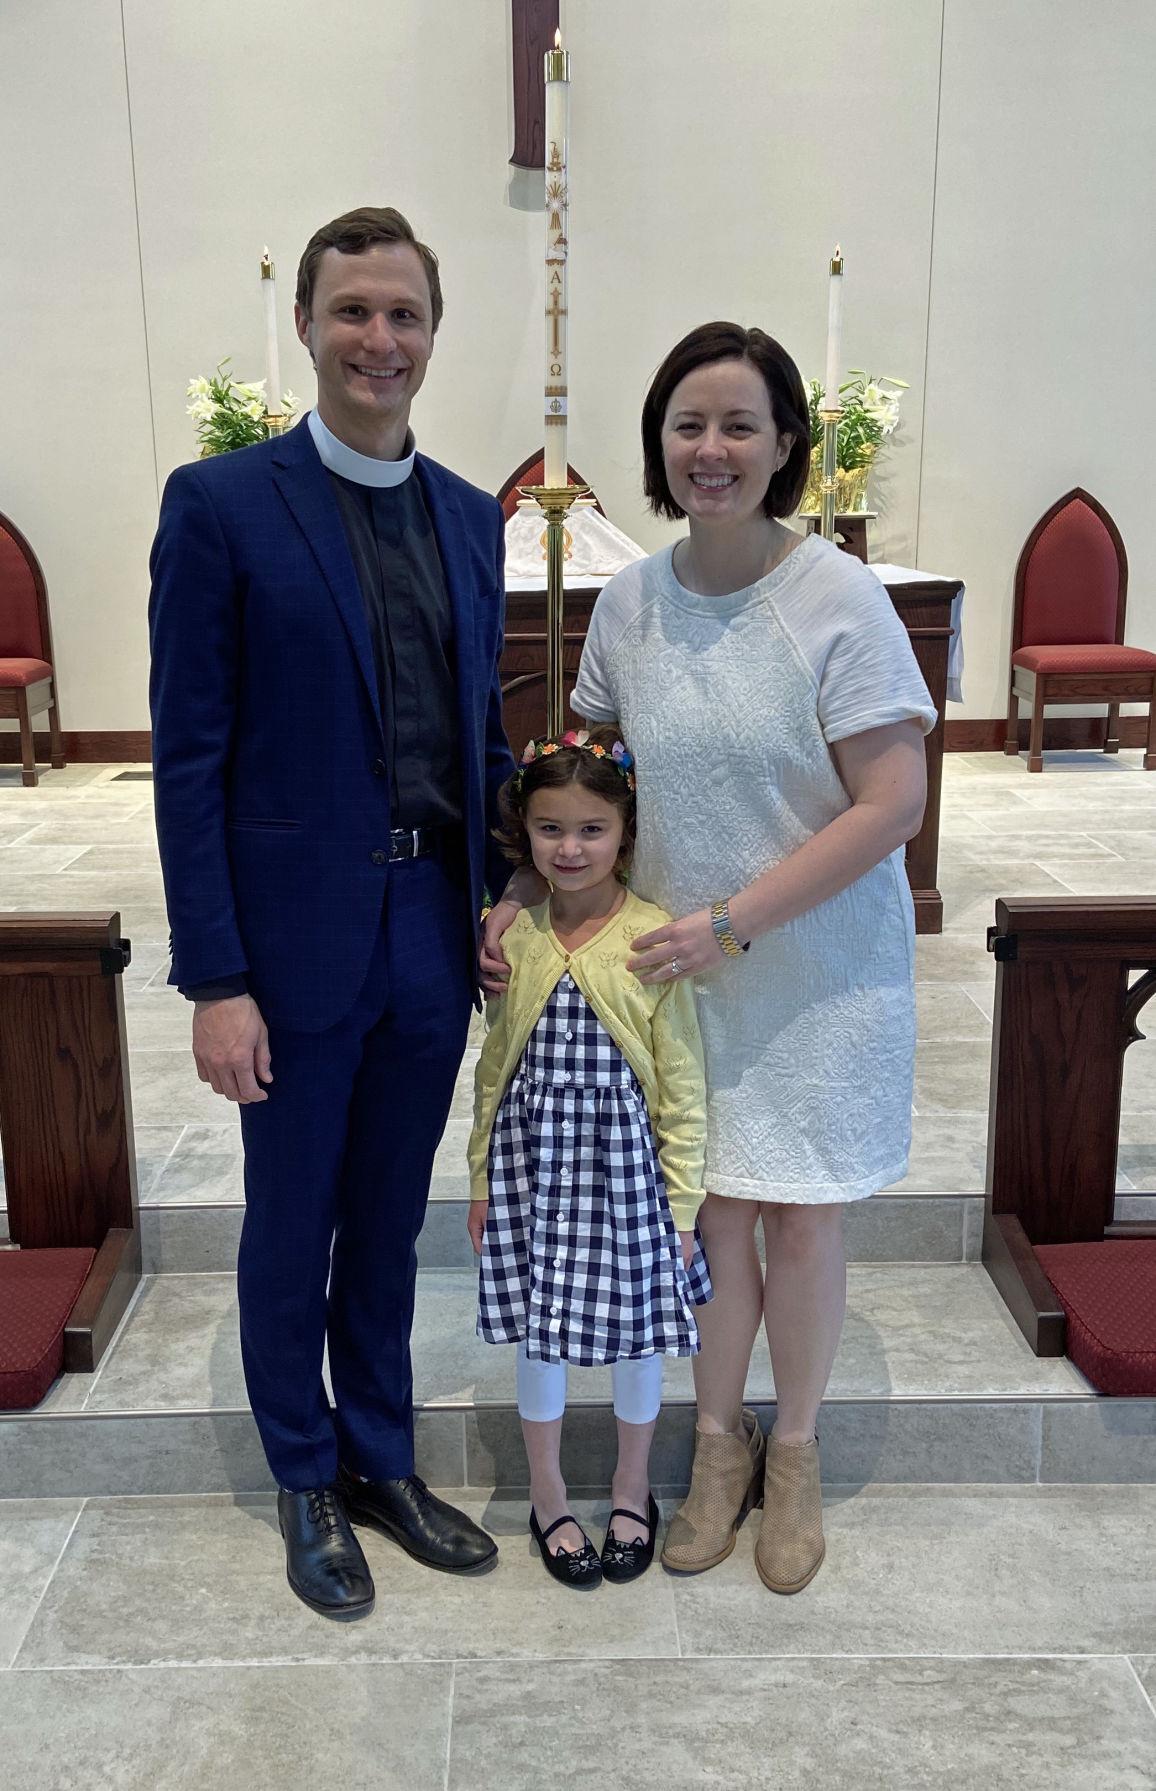 New rector arrives at Galveston's historic Trinity Episcopal Church